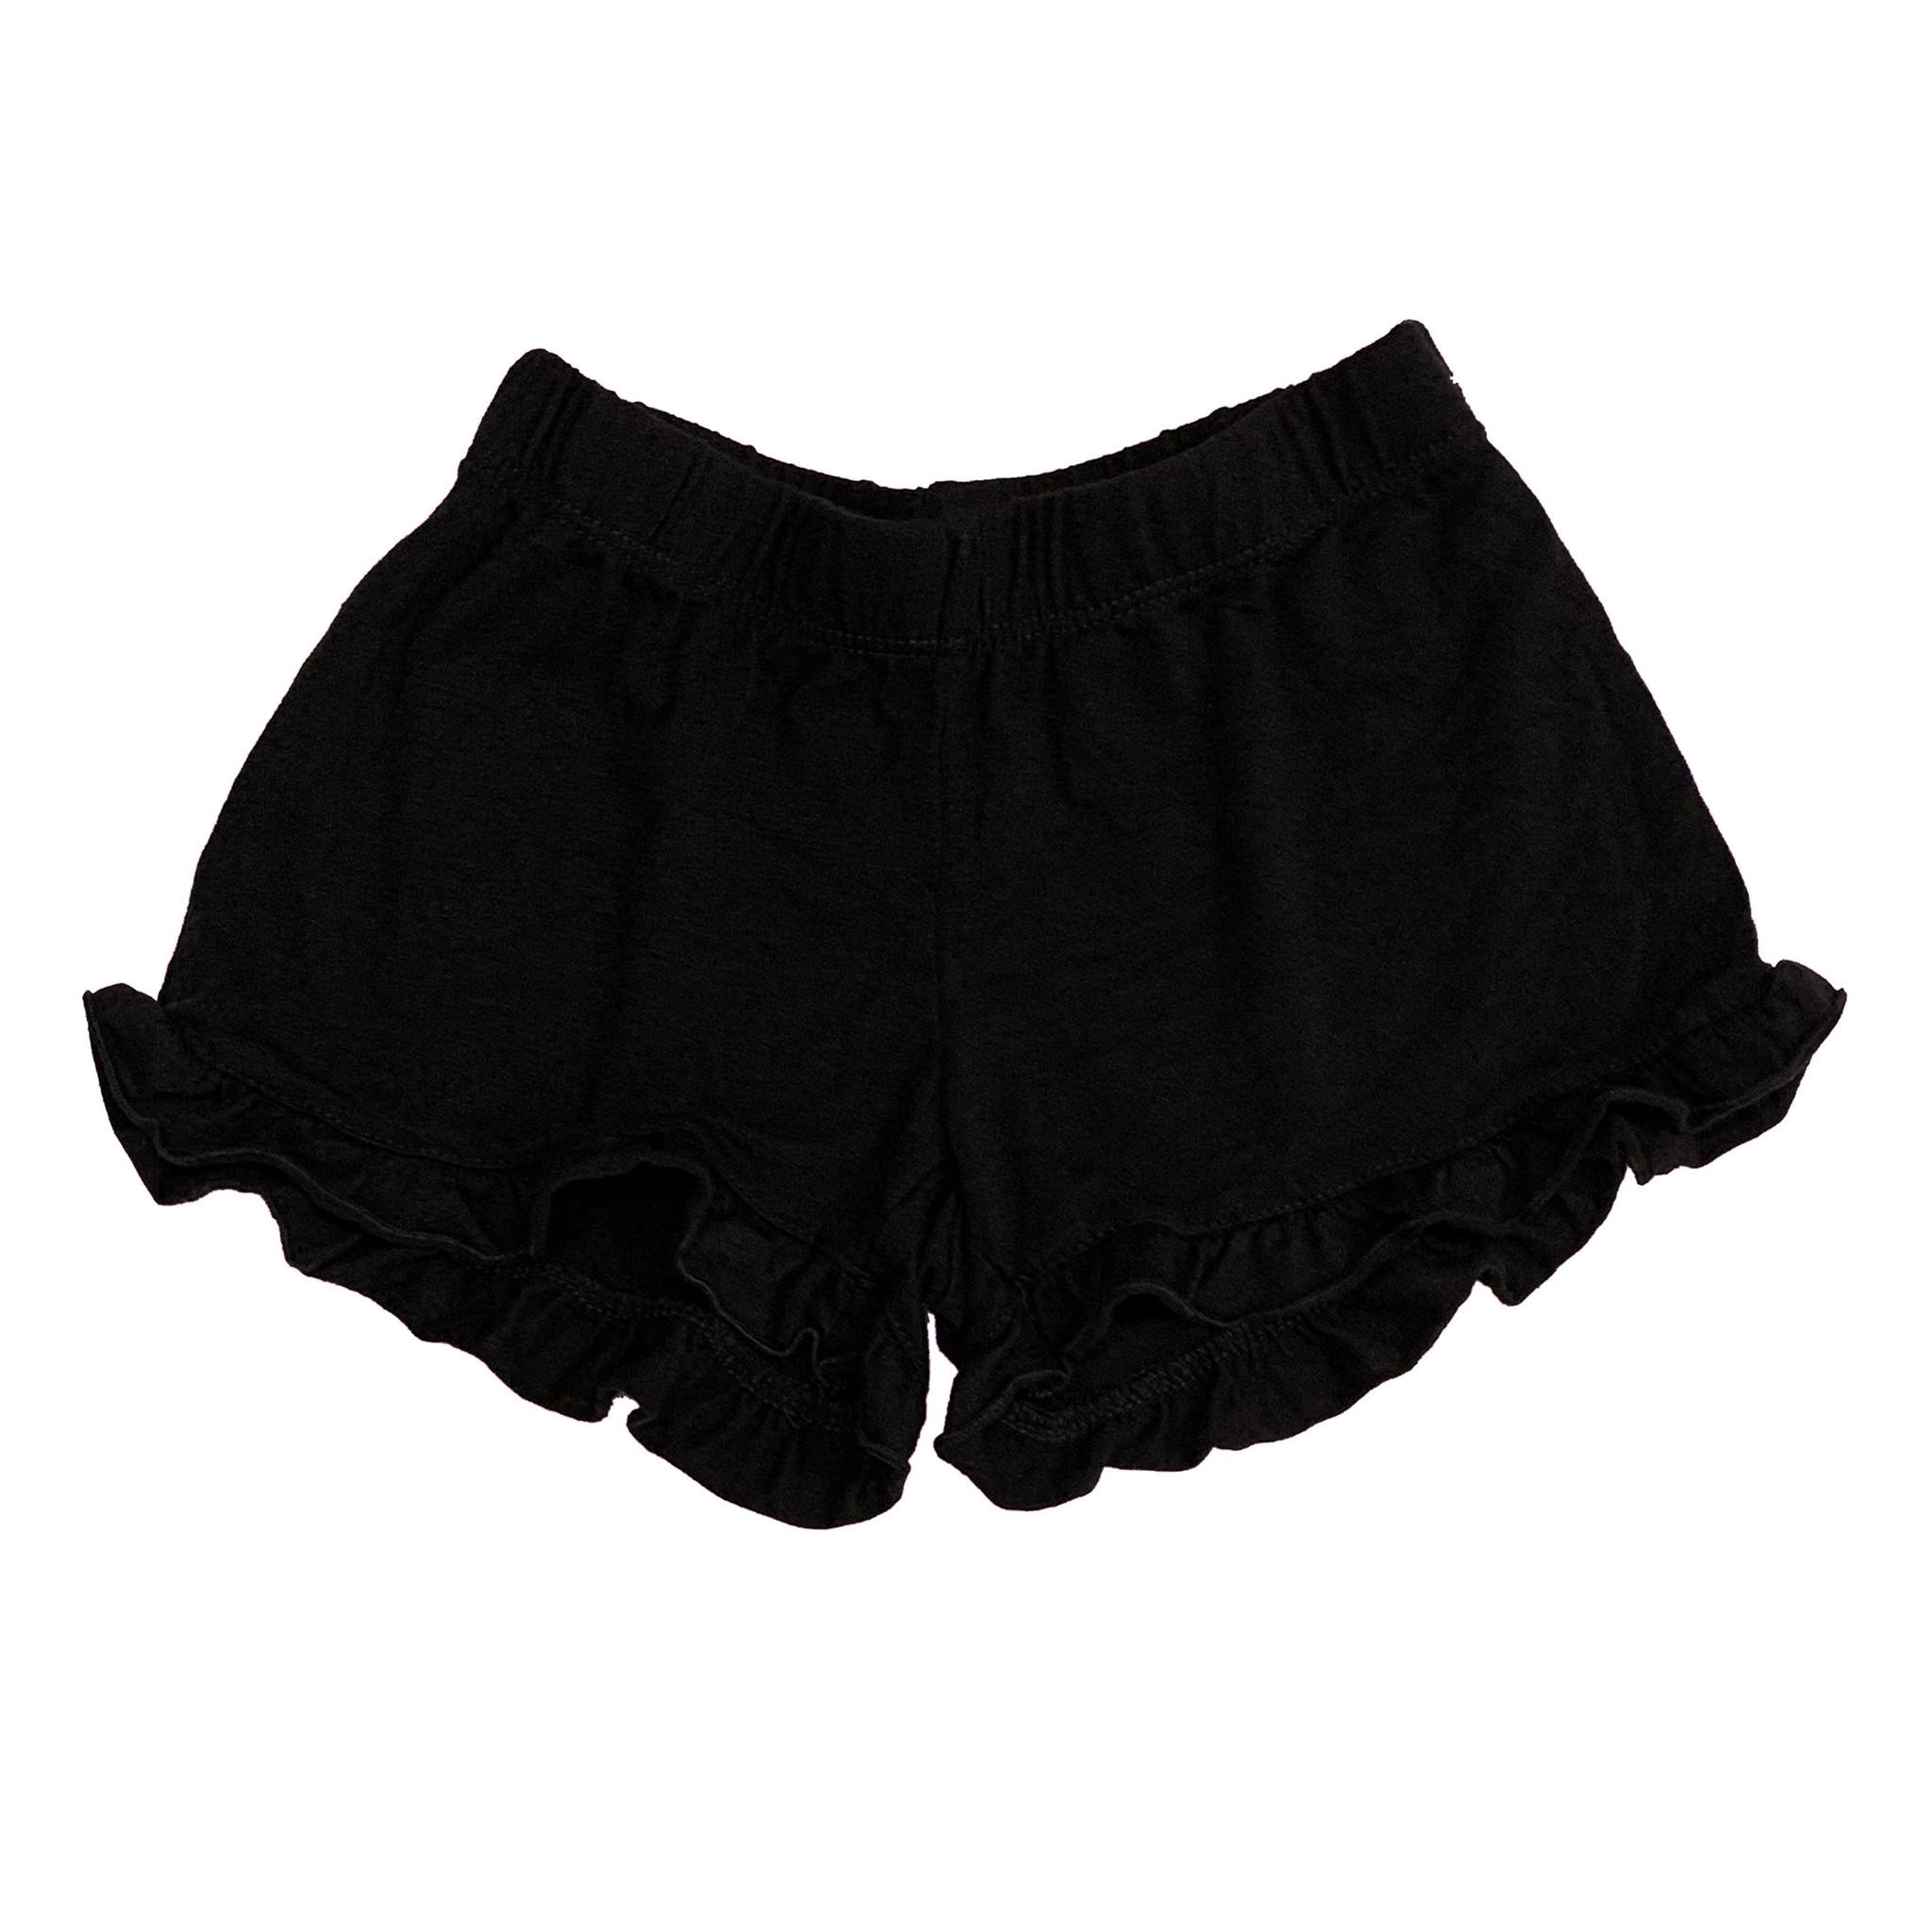 Firehouse Black Ruffle Short